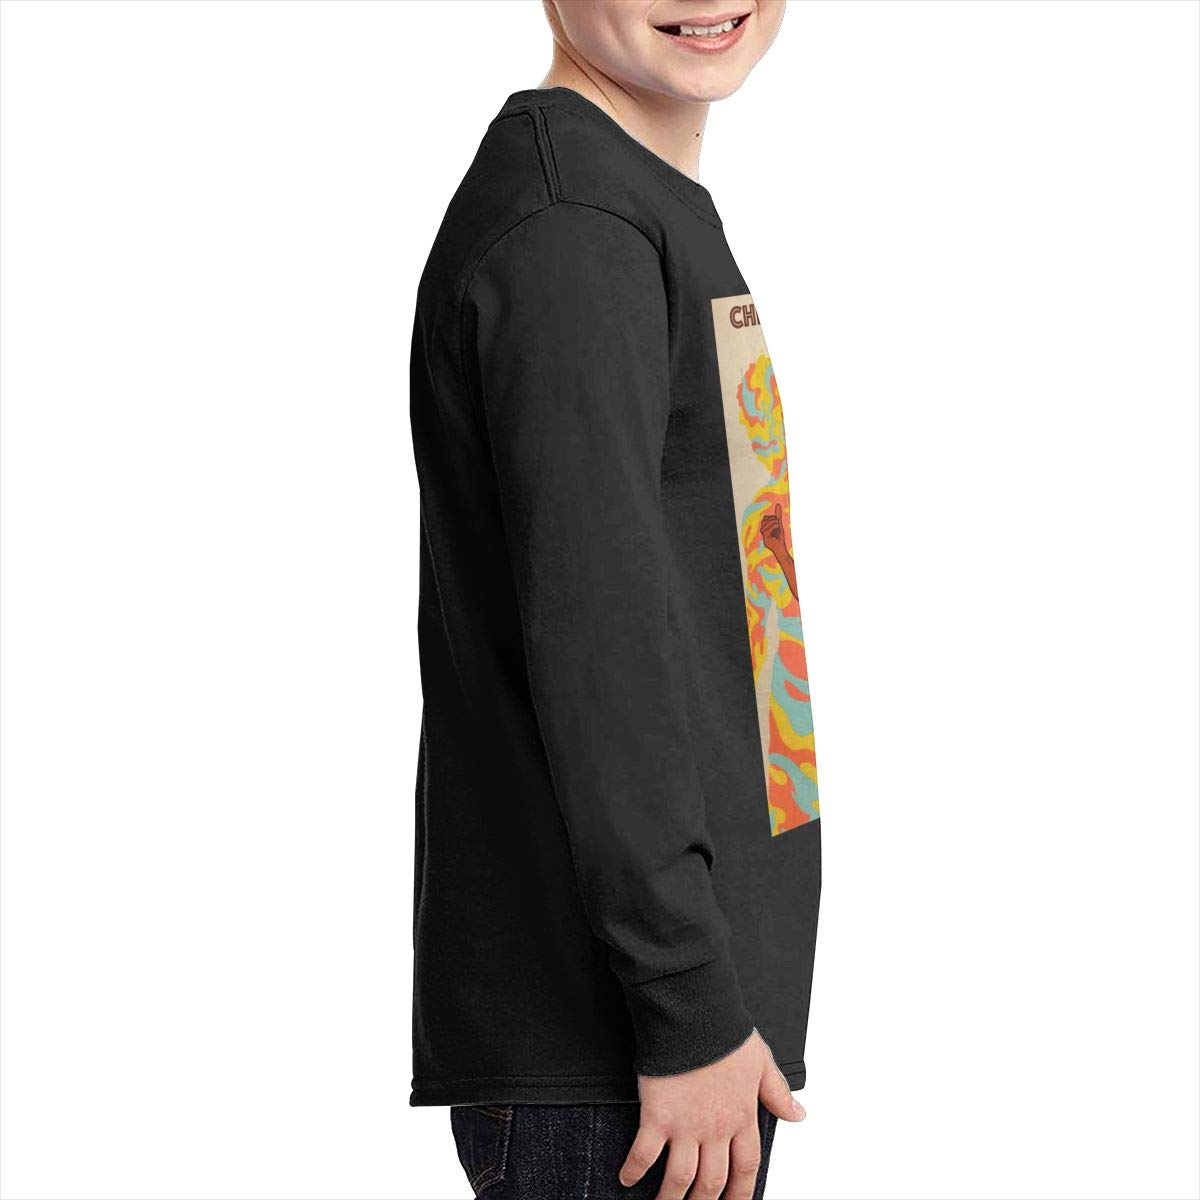 MichaelHazzard Childish Gambino Youth Wearable Long Sleeve Crewneck Tee T-Shirt for Boys and Girls